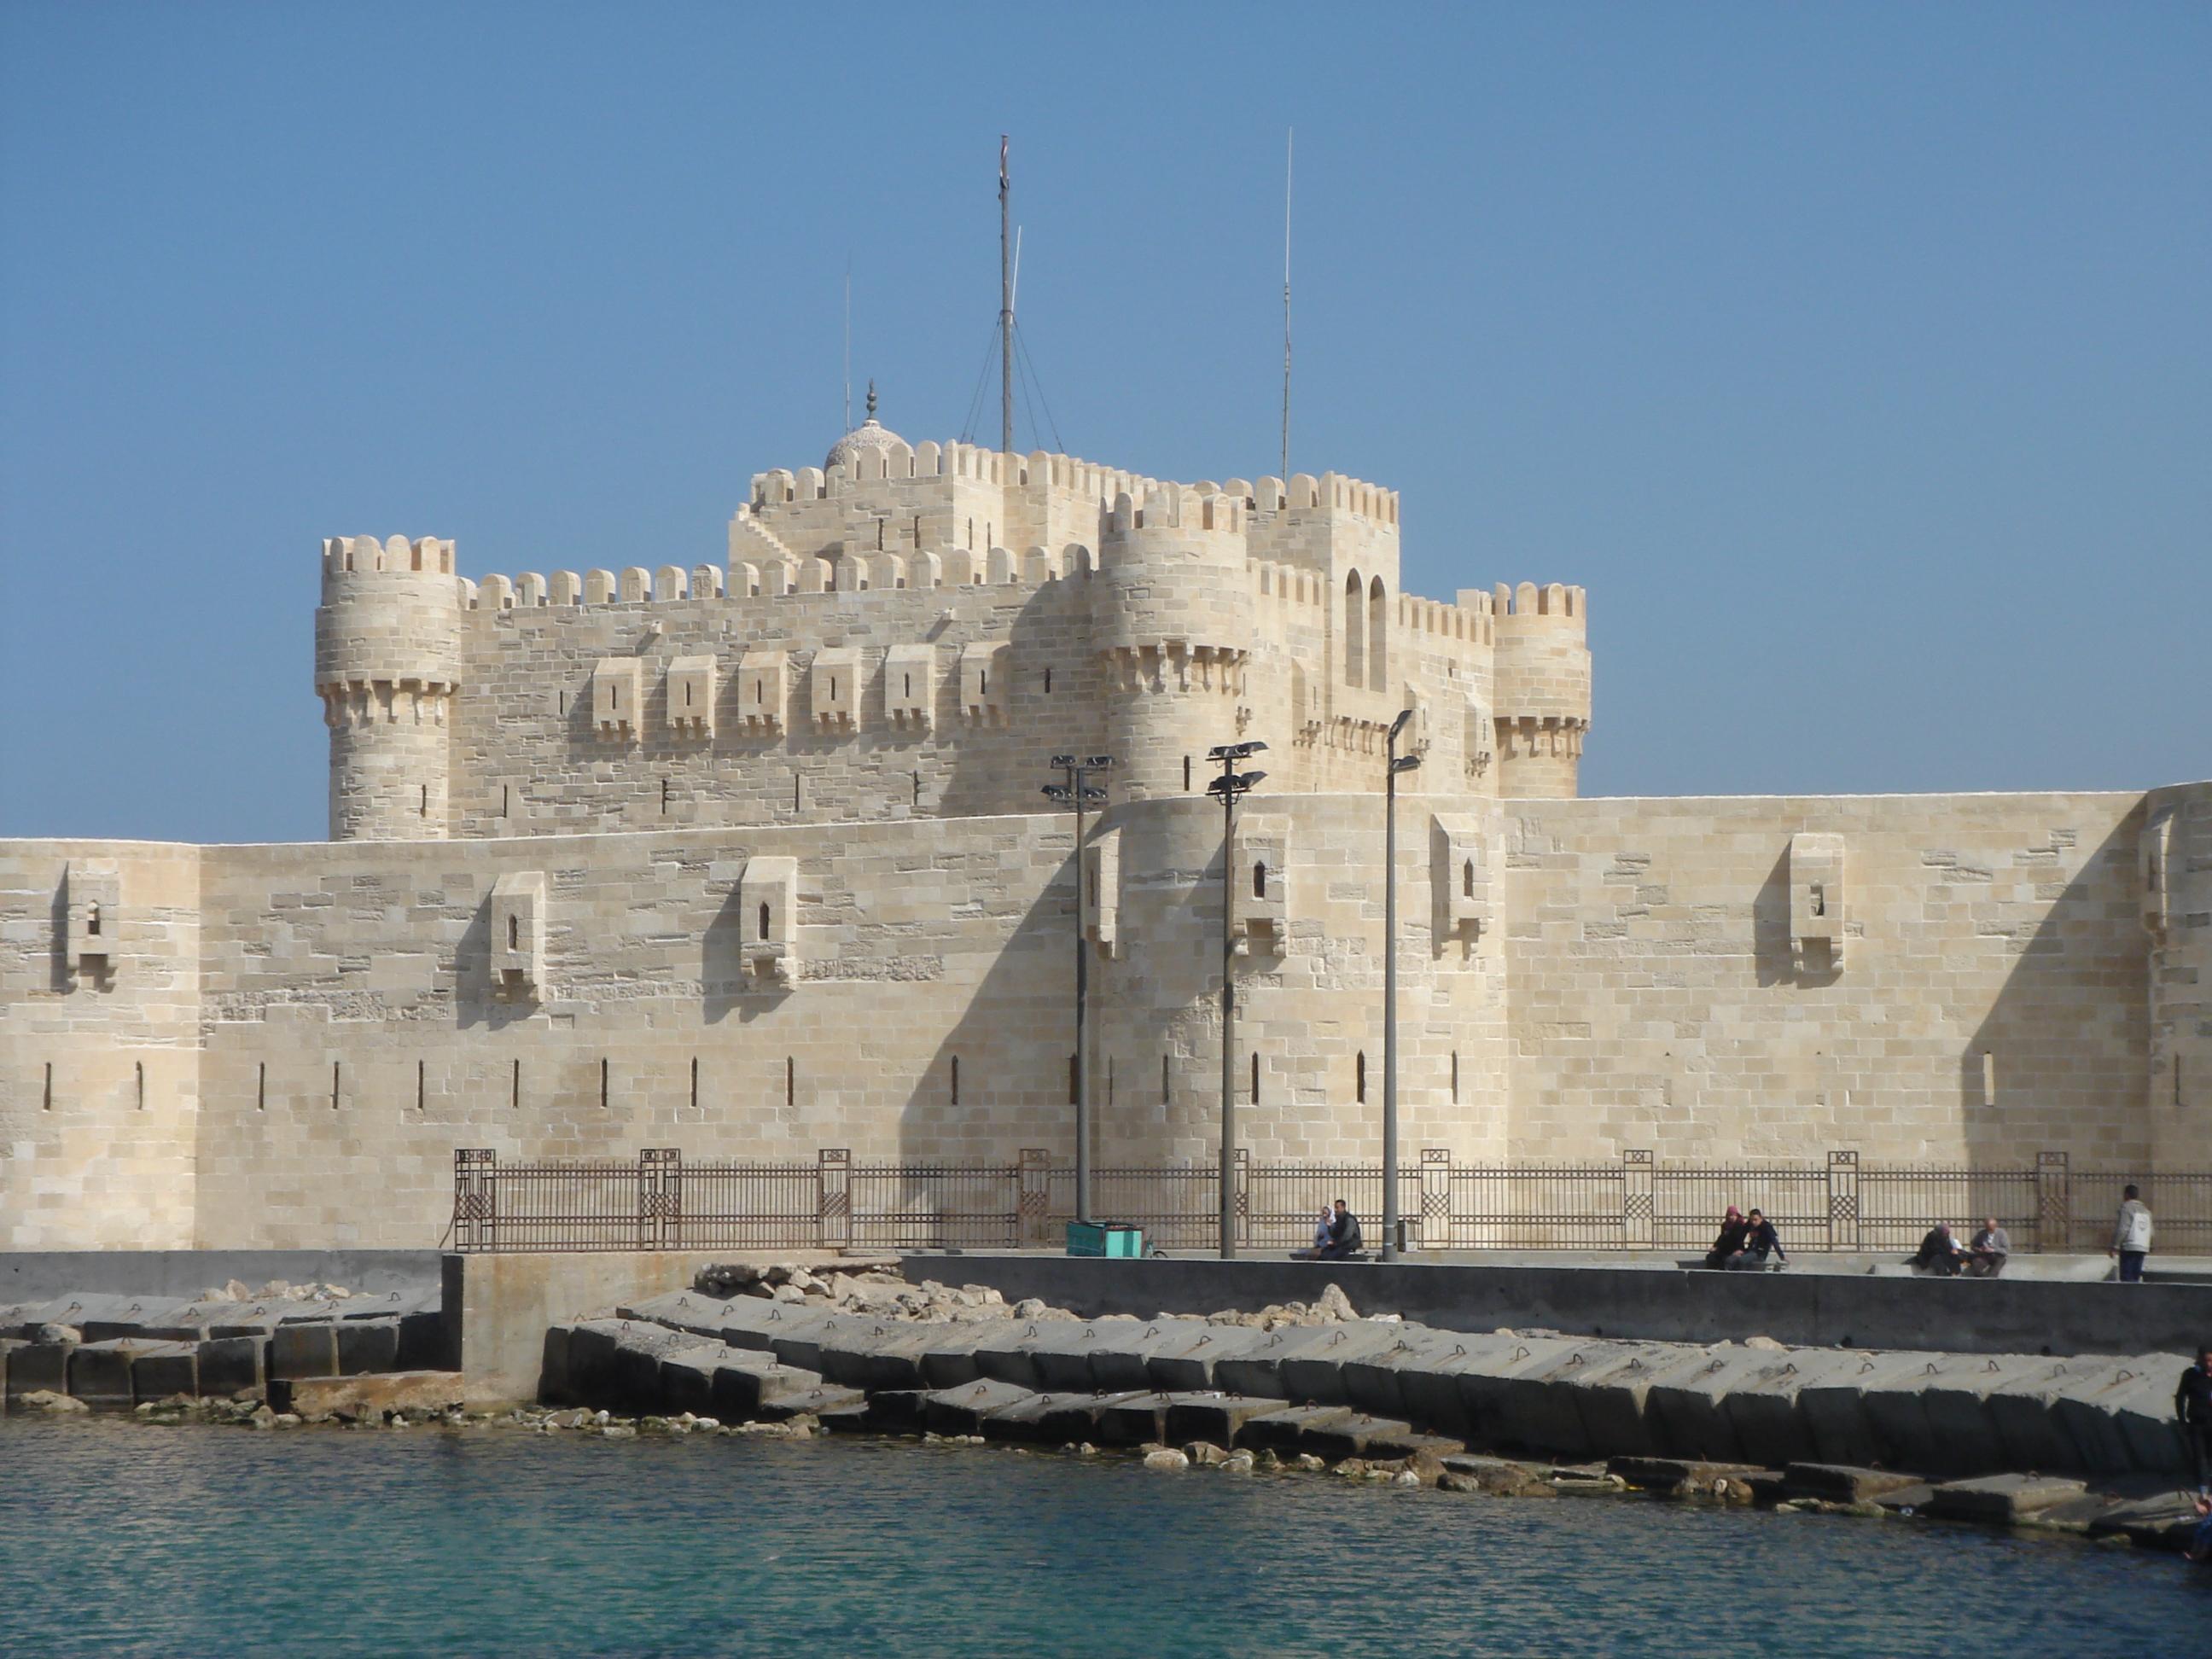 http://upload.wikimedia.org/wikipedia/commons/1/11/Qaitbay%27s_Citadel_2.JPG